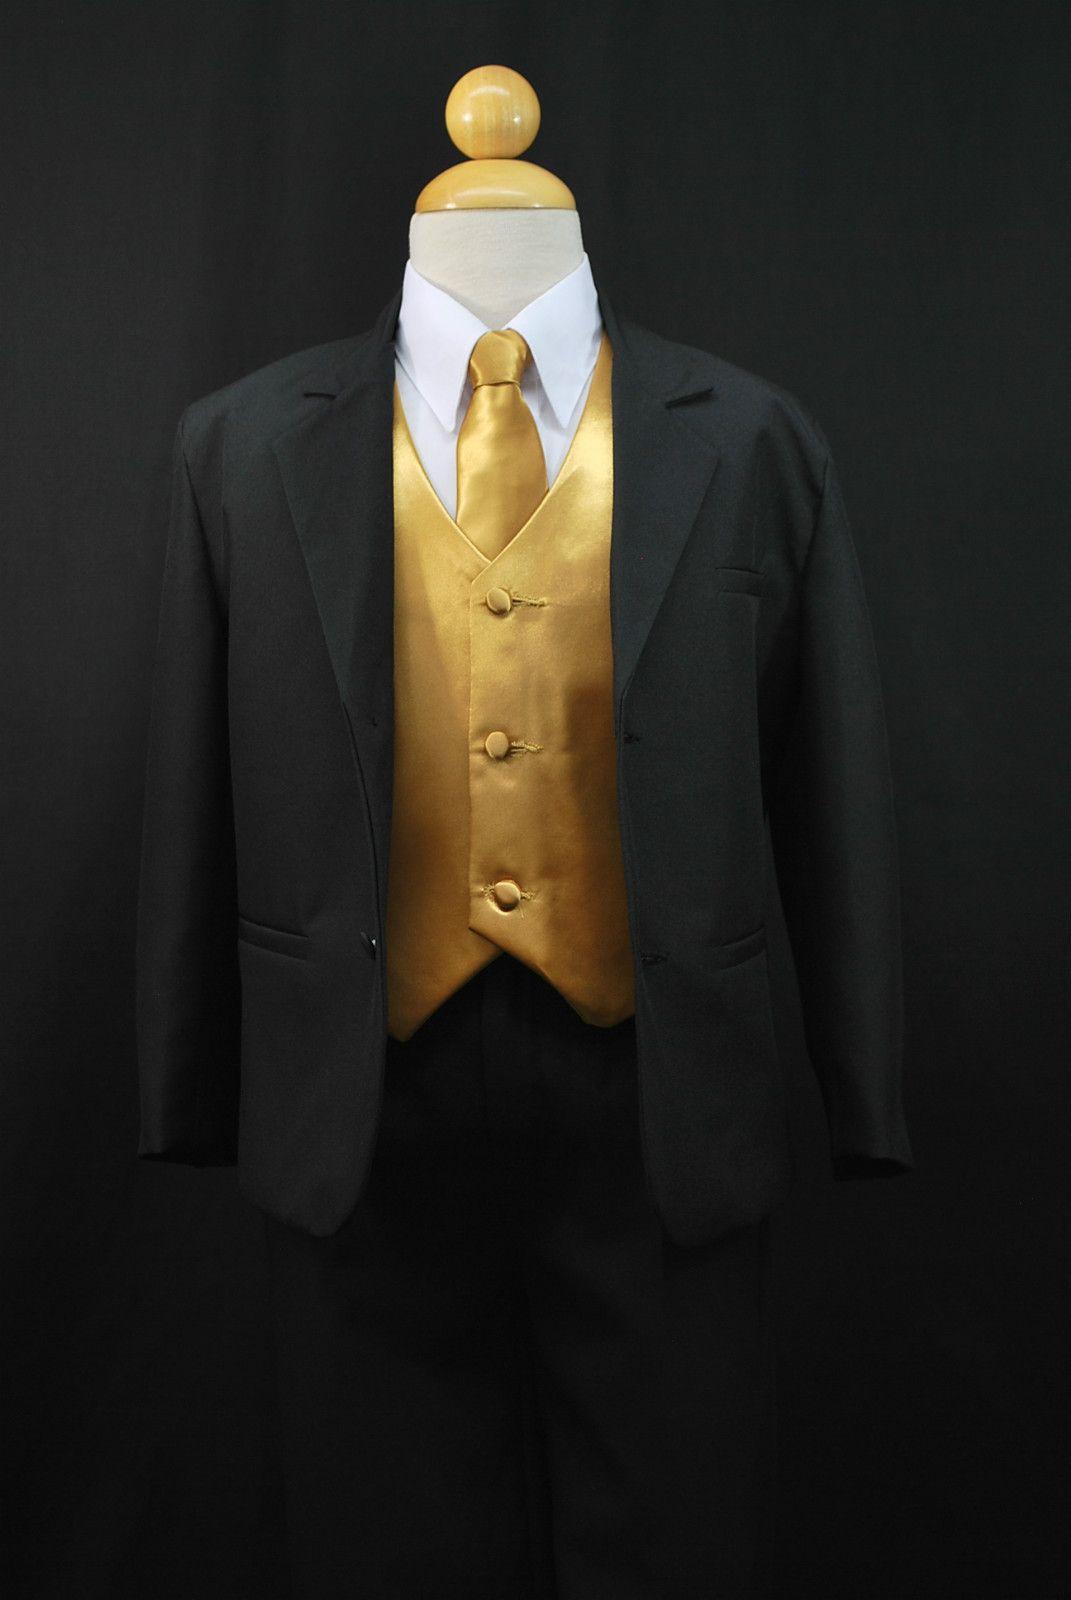 Black and Gold wedding theme | Wedding suits, Gold wedding and Wedding